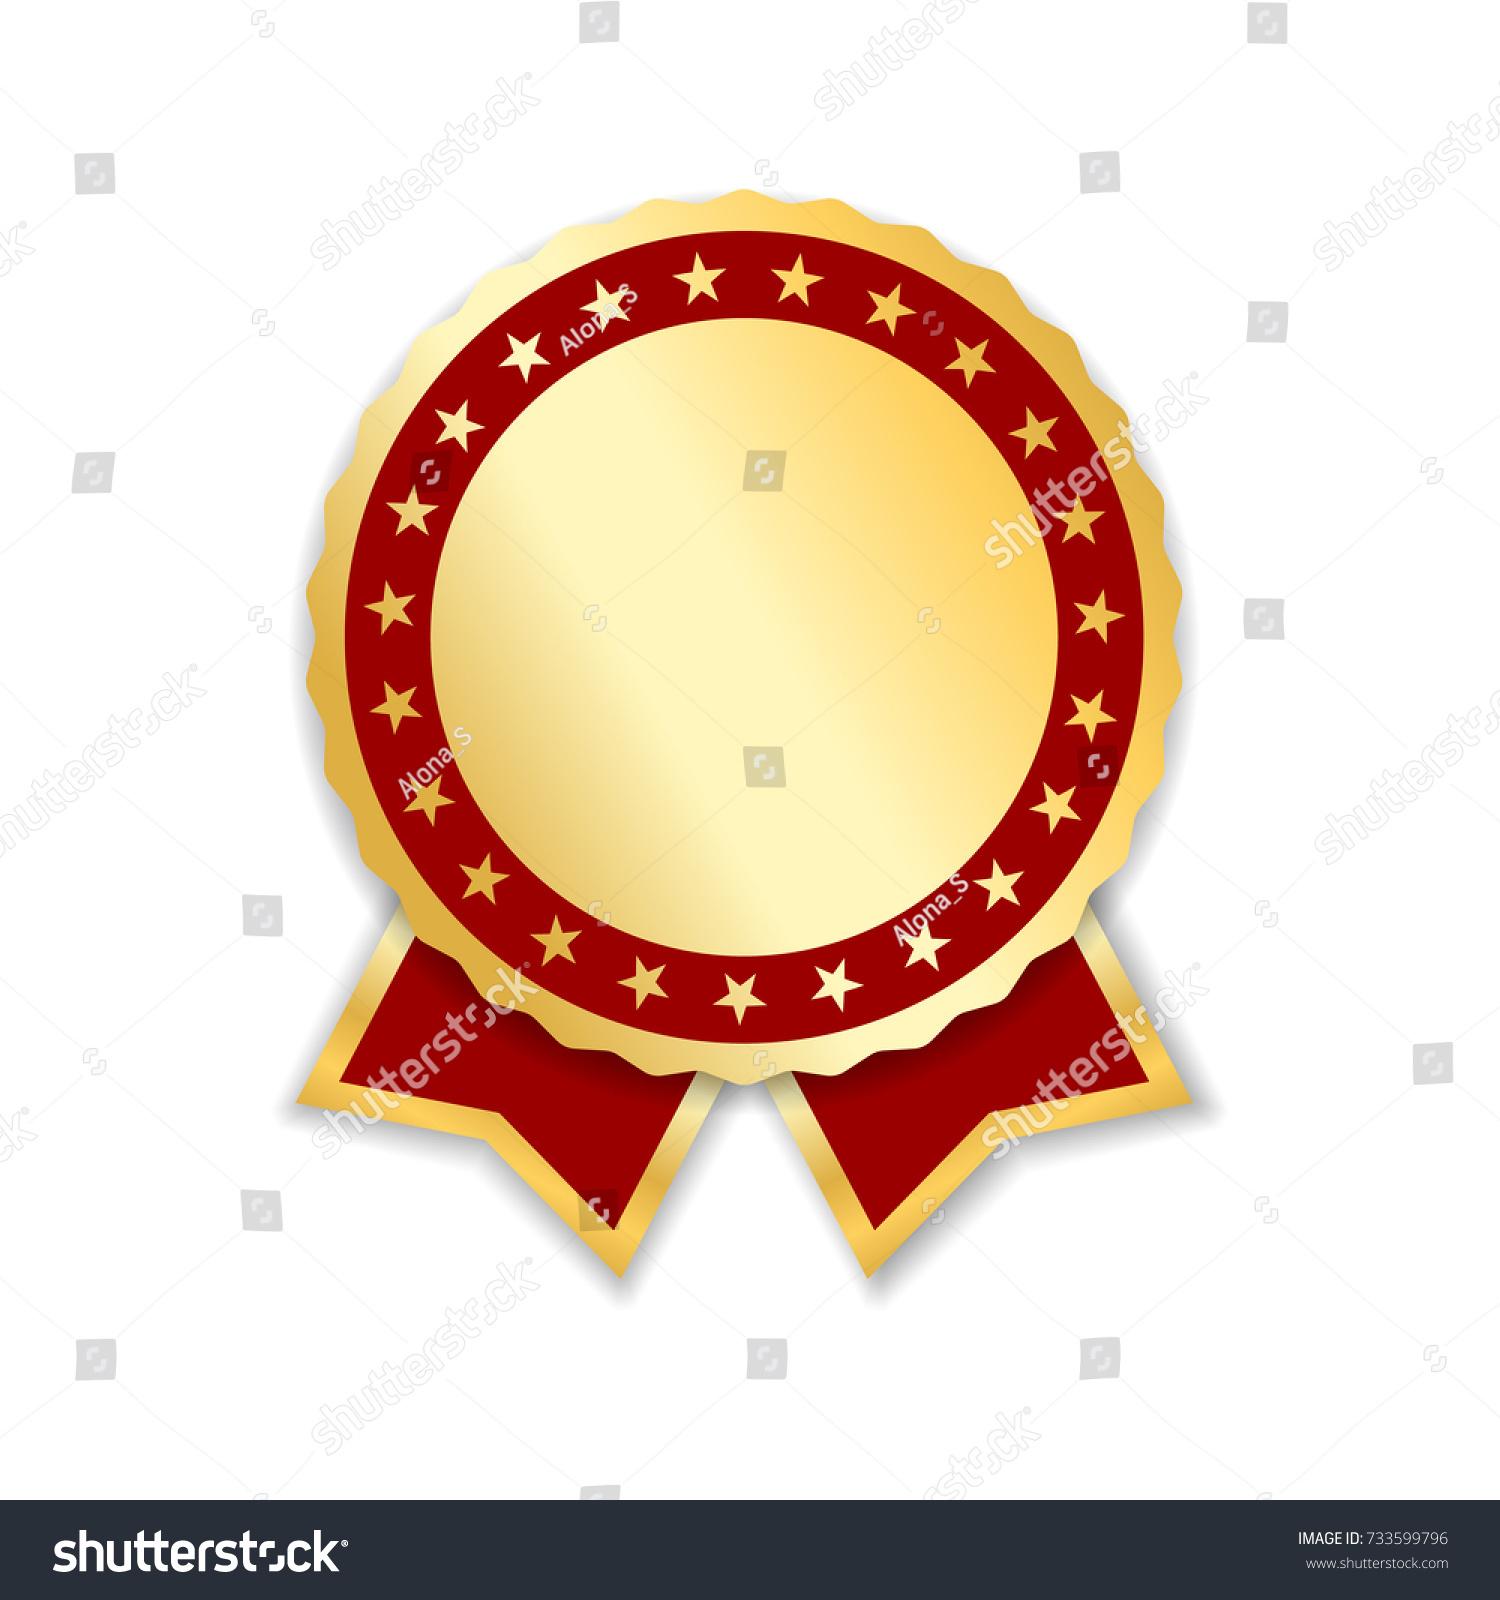 Award ribbon isolated gold red design stock vector 733599796 award ribbon isolated gold red design medal label badge certificate symbol buycottarizona